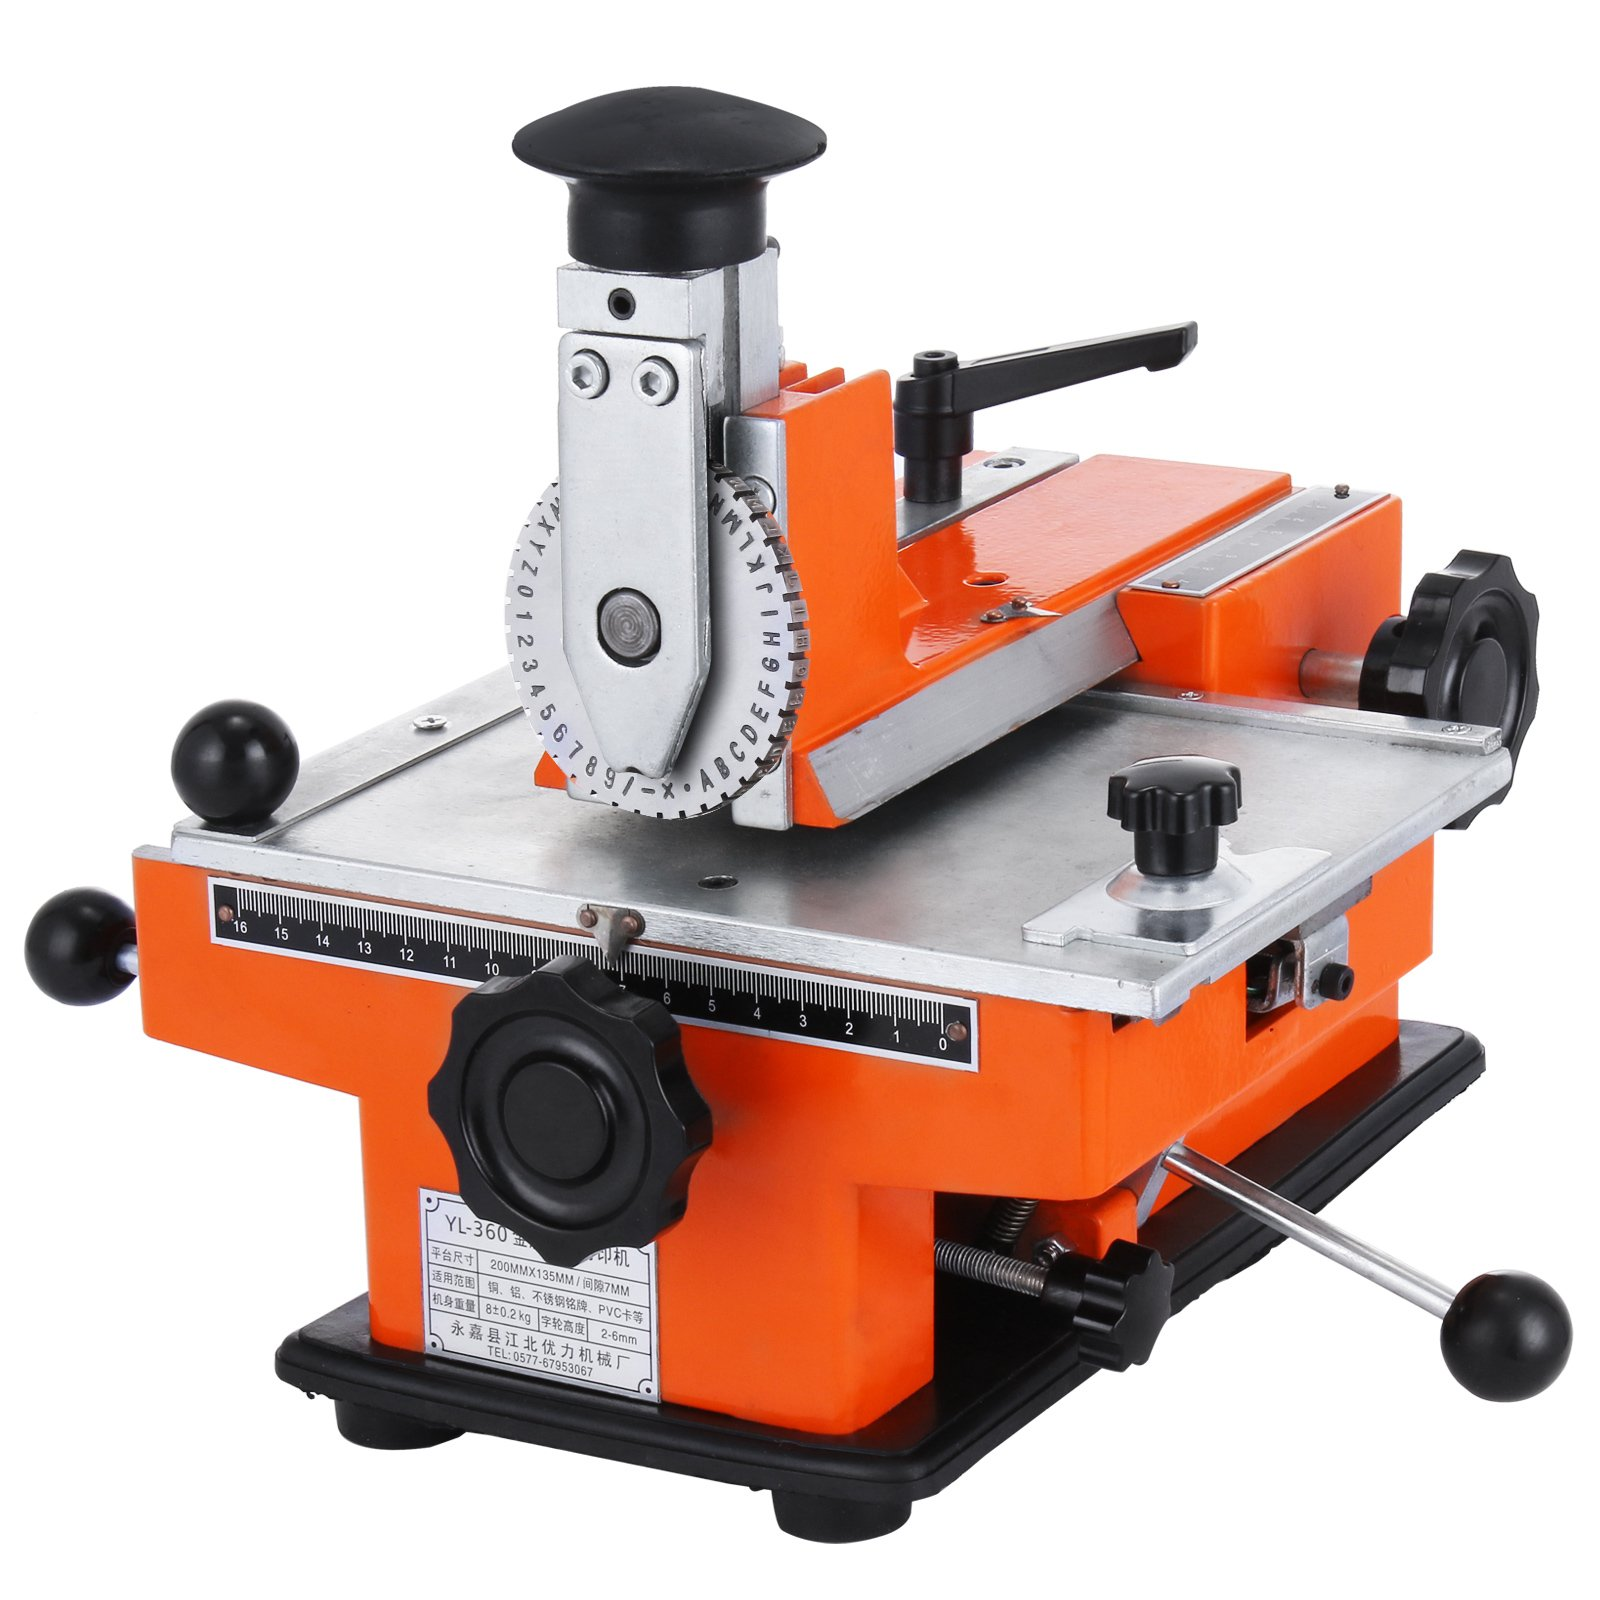 BestEquip Semi-automatic Metal Stamping Printer Sheet Embosser Metal Embosser Suitable for Copper Aluminum Stainless Steel and Plastic (metal stamping printer)